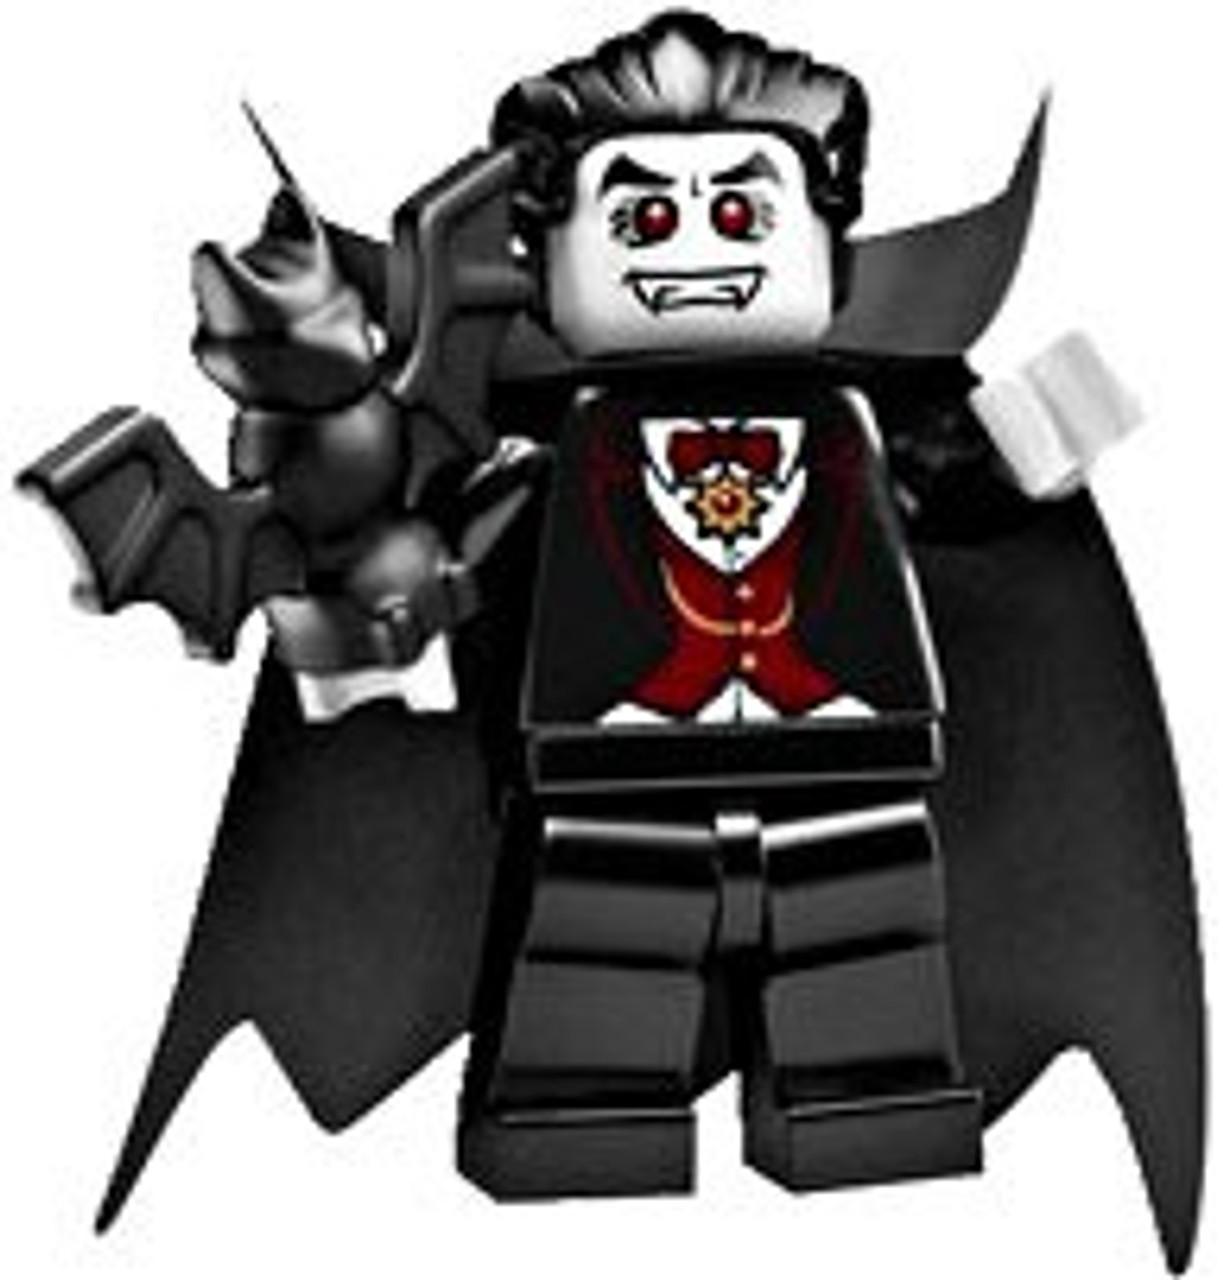 LEGO Minifigures Series 2 Dracula Vampire Minifigure [Loose]